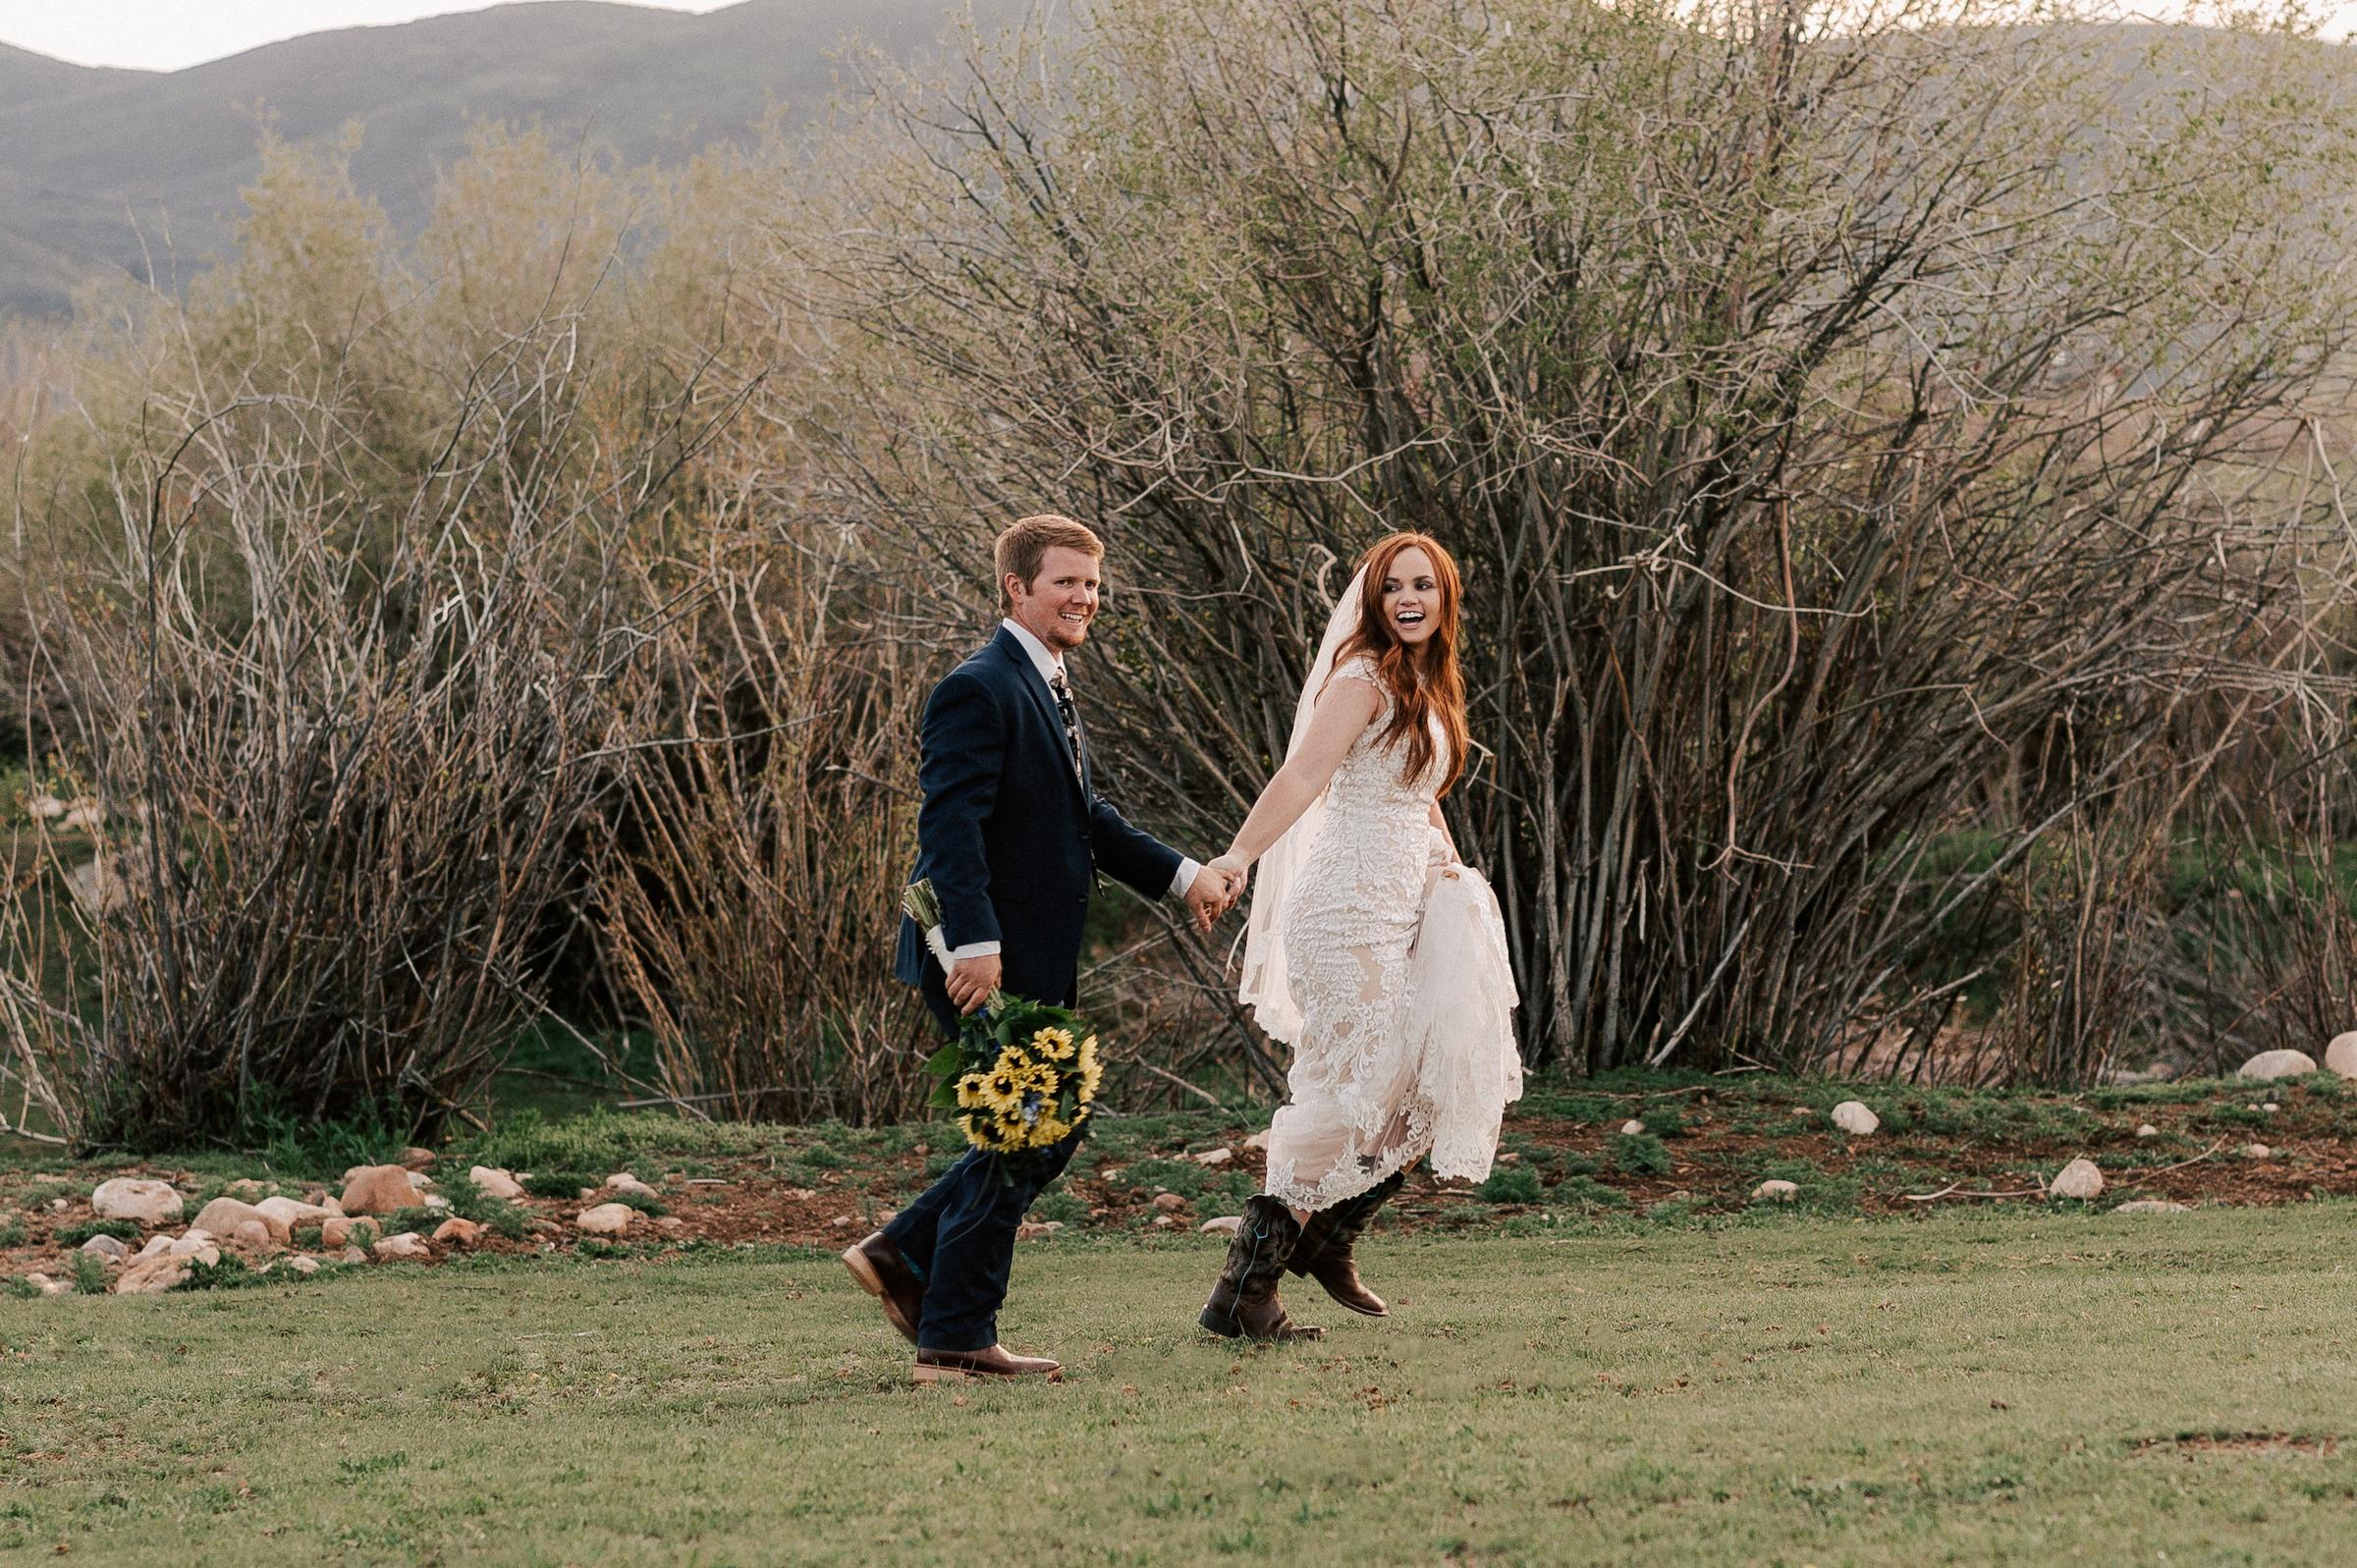 Wedding Dress Cowboy Boots Horse Ranch Tew Treasures Photography 1